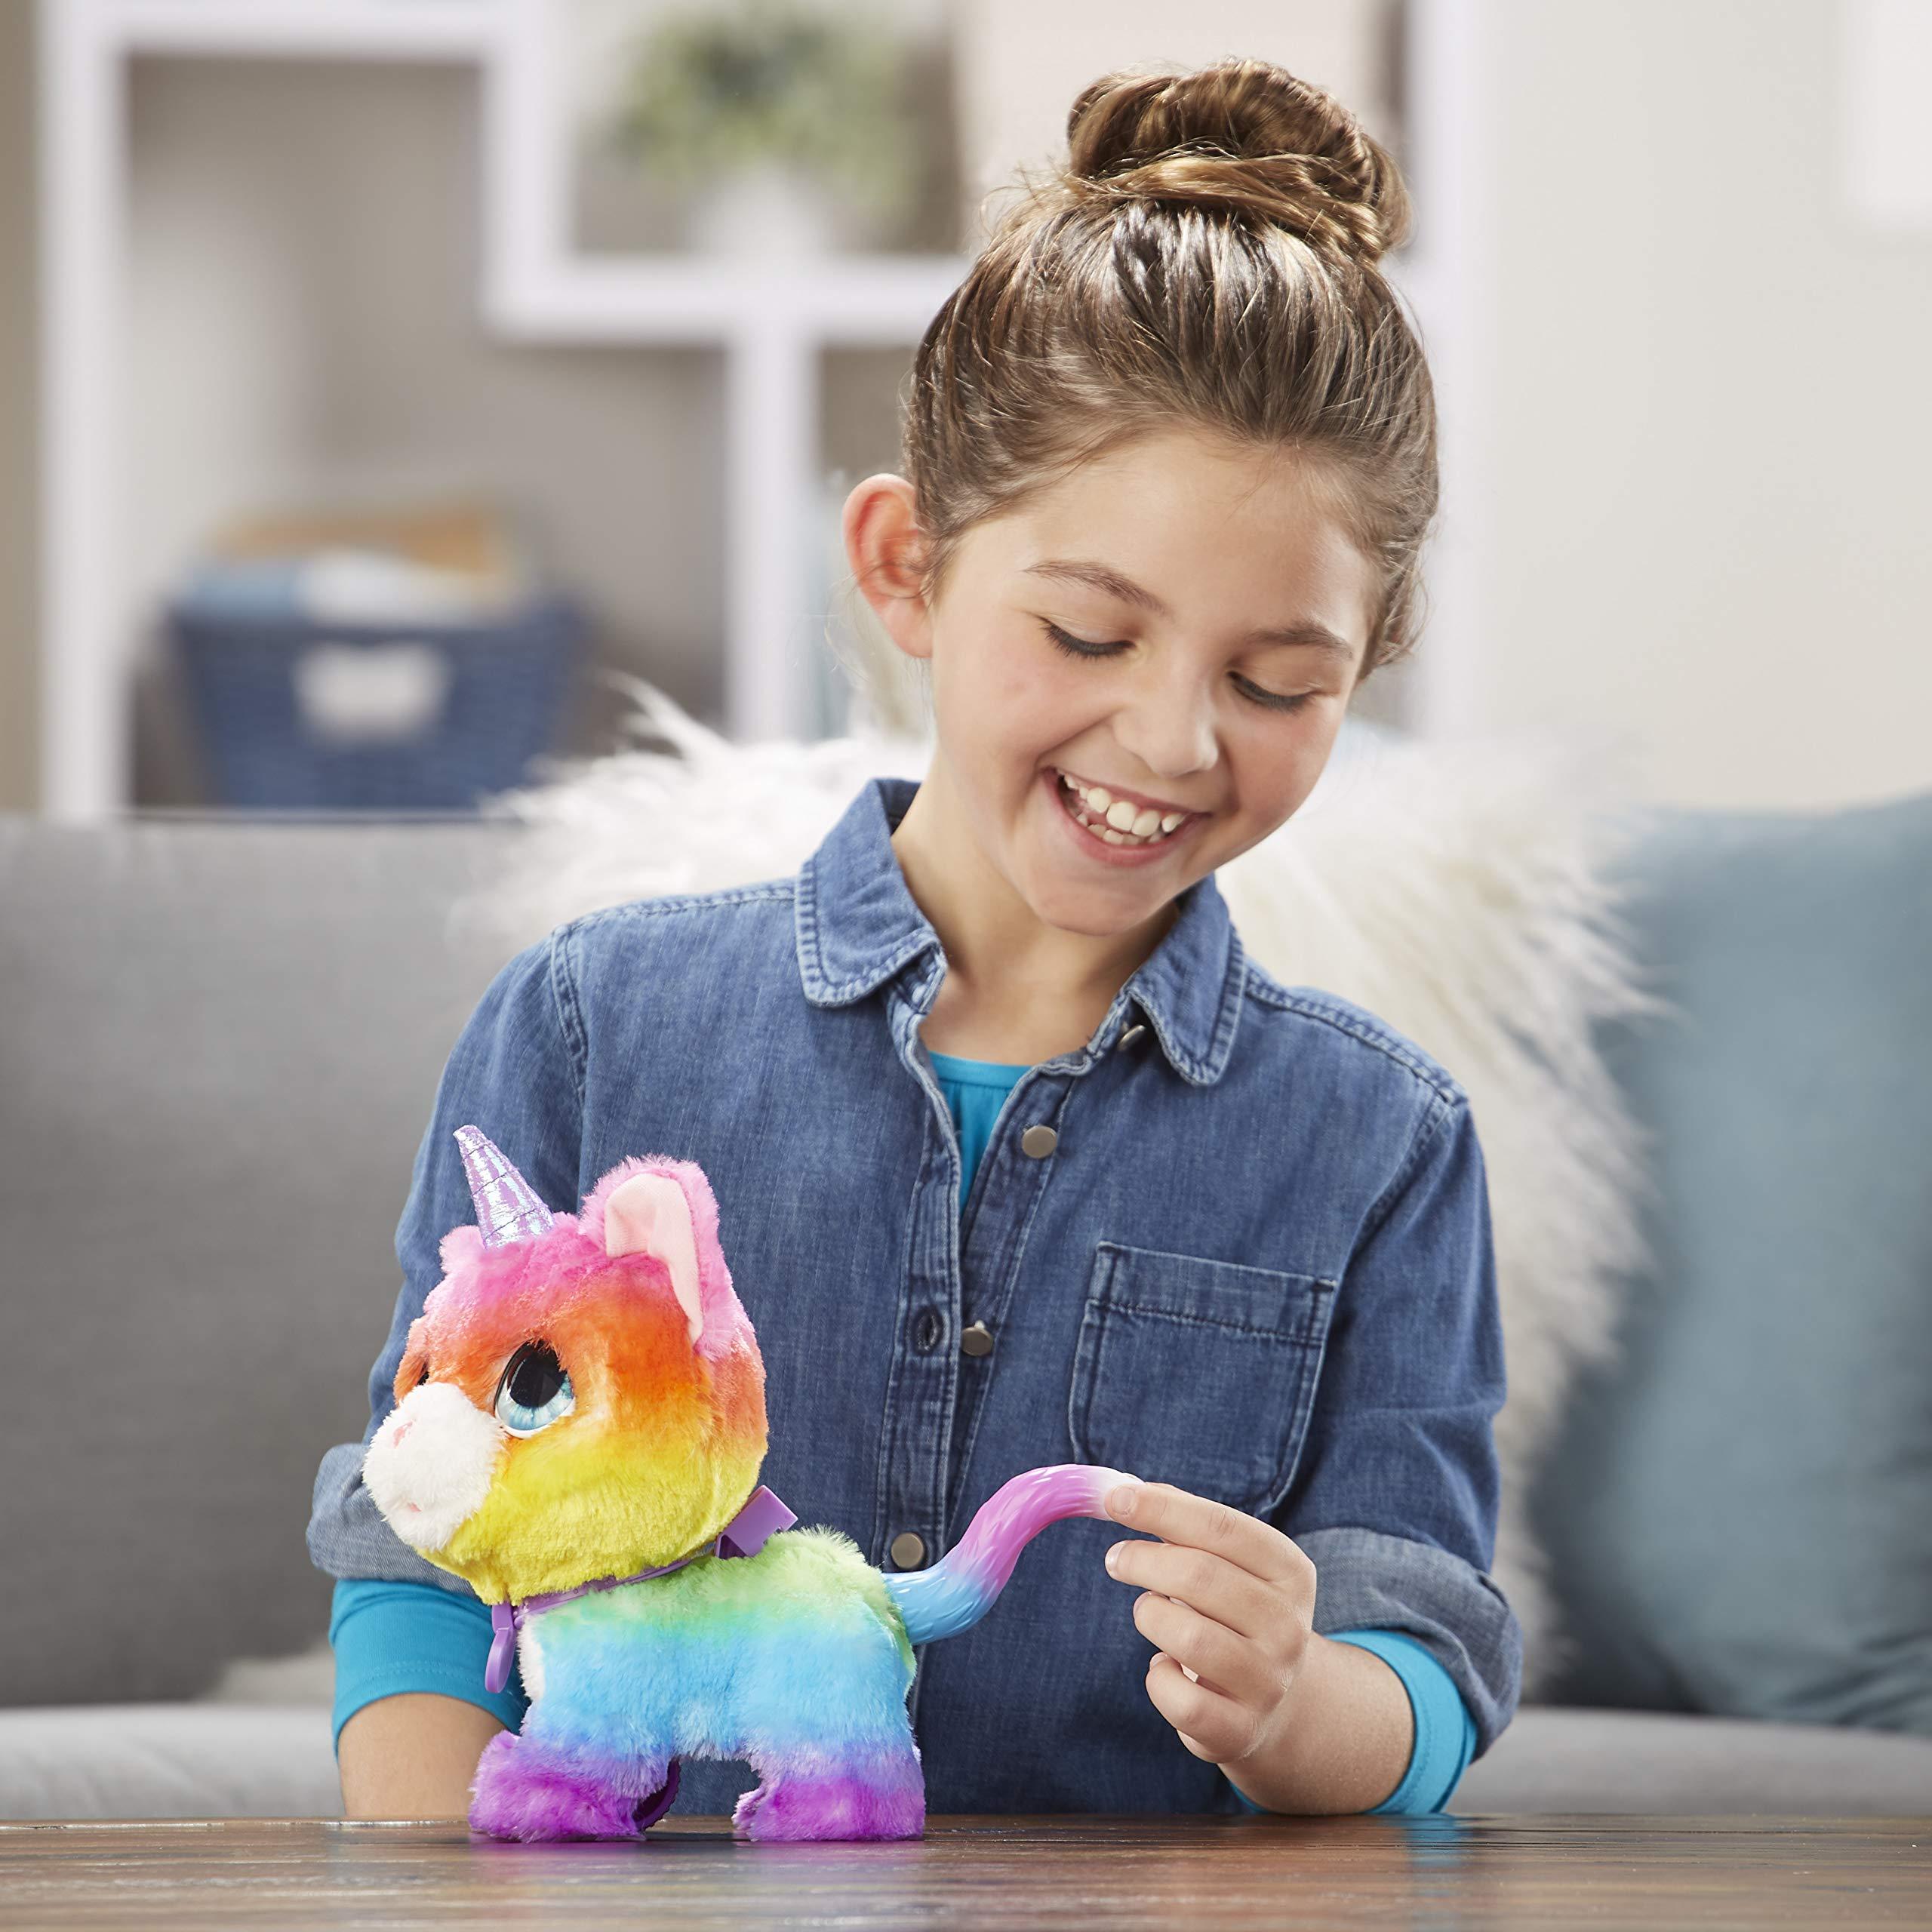 FurReal Friends E5307EU5 FRR WALKALOTS Big Wags Unicorn CAT, Multicolour by FurReal (Image #4)